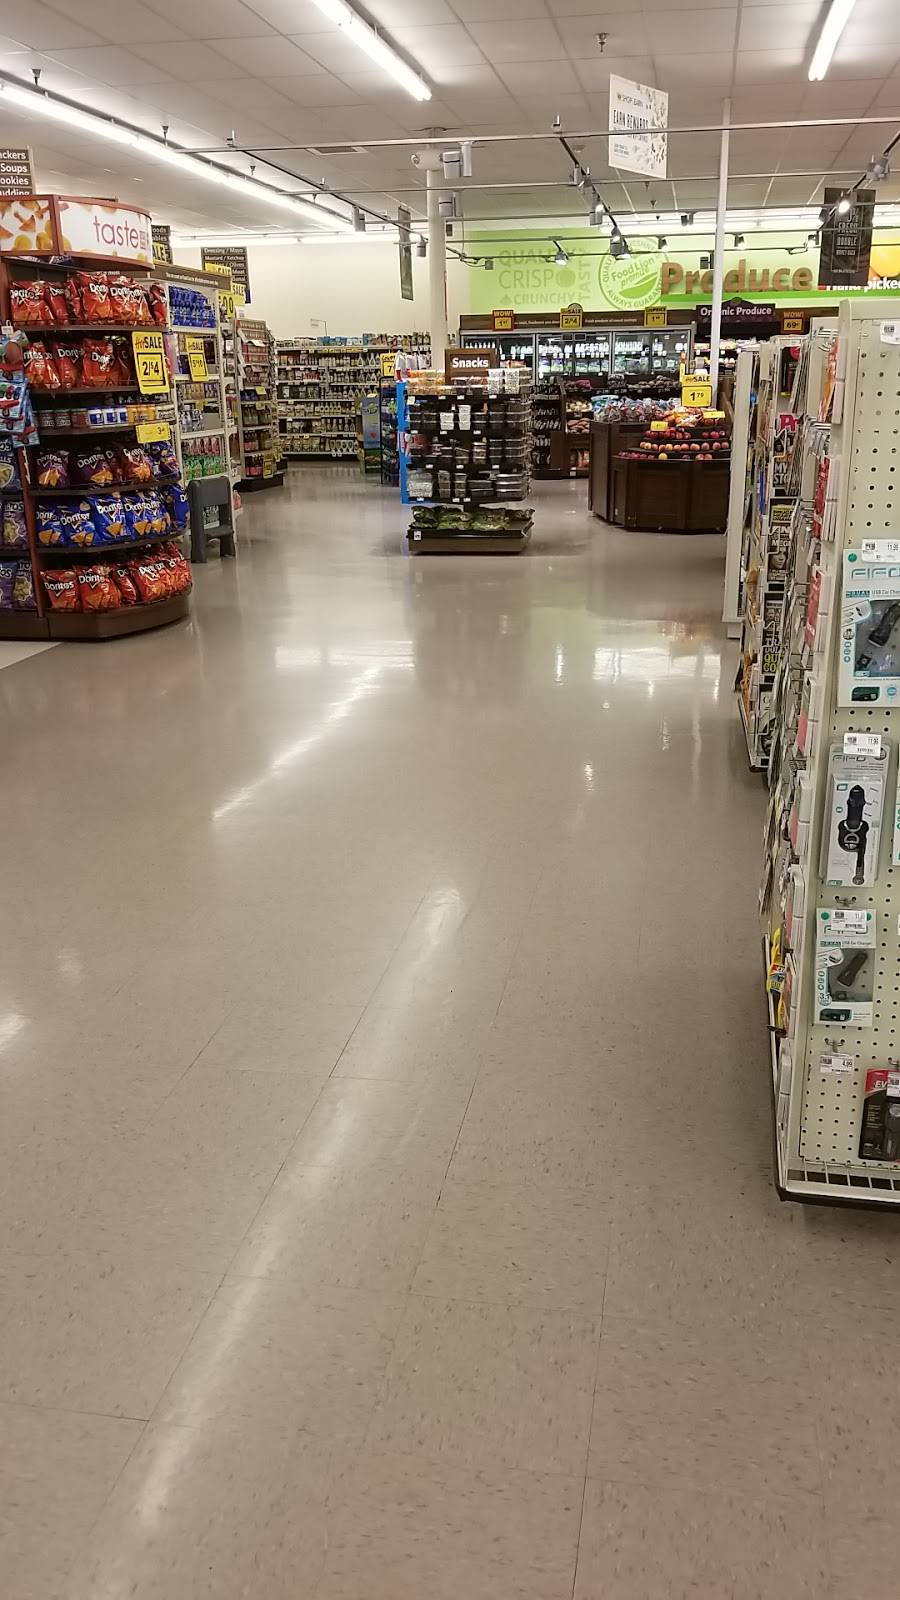 Food Lion - store  | Photo 7 of 8 | Address: 4826 Country Club Rd, Winston-Salem, NC 27104, USA | Phone: (336) 760-2471